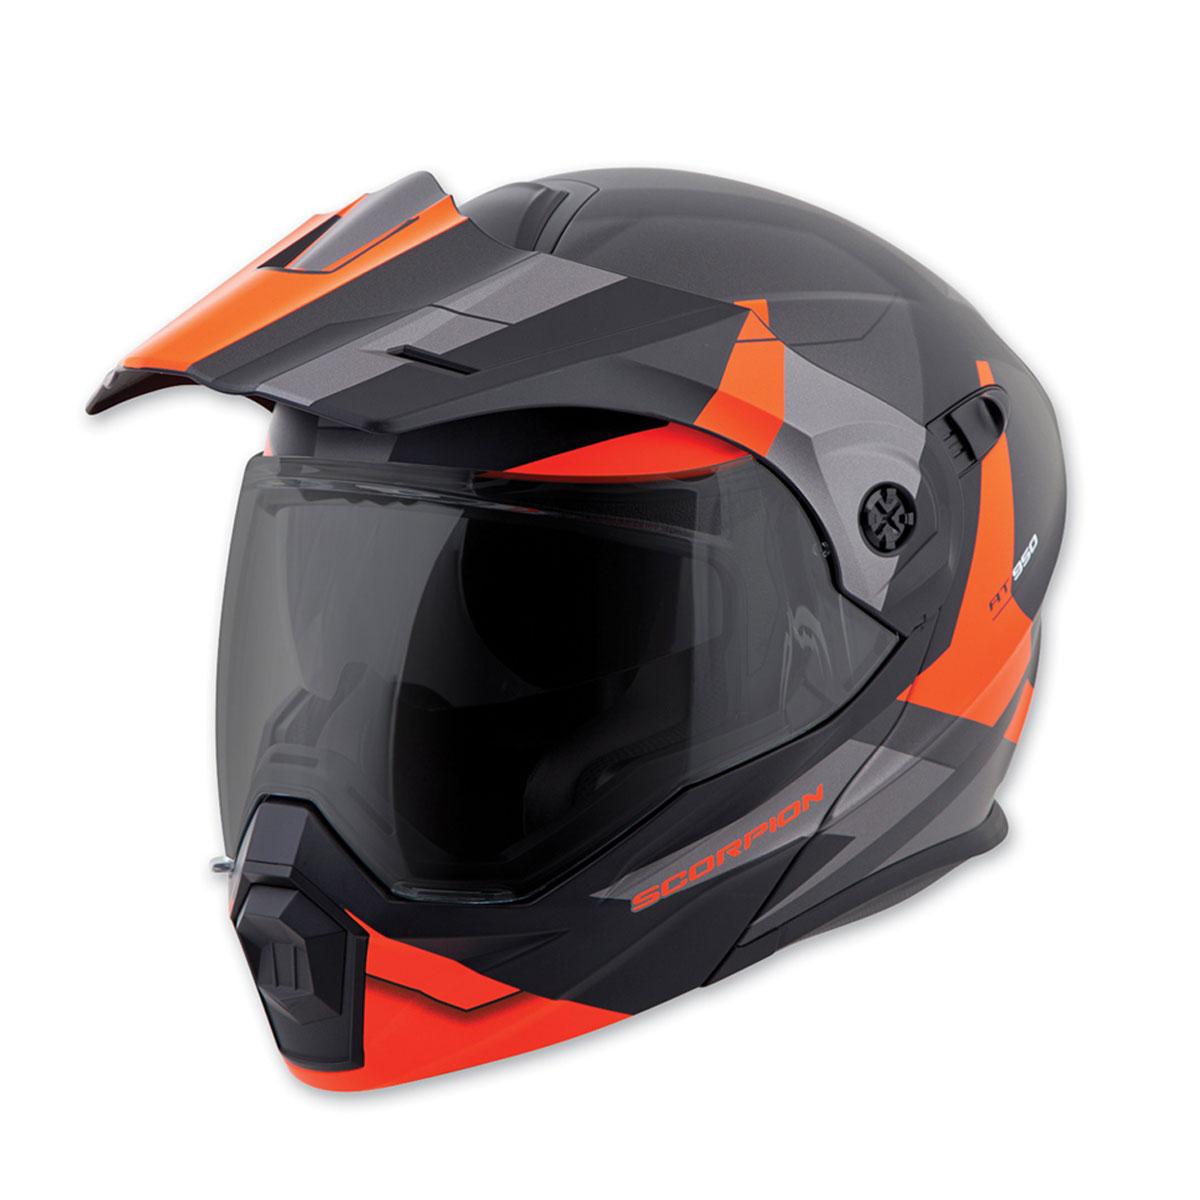 Scorpion EXO EXO-AT950 Neocon Orange Modular Helmet